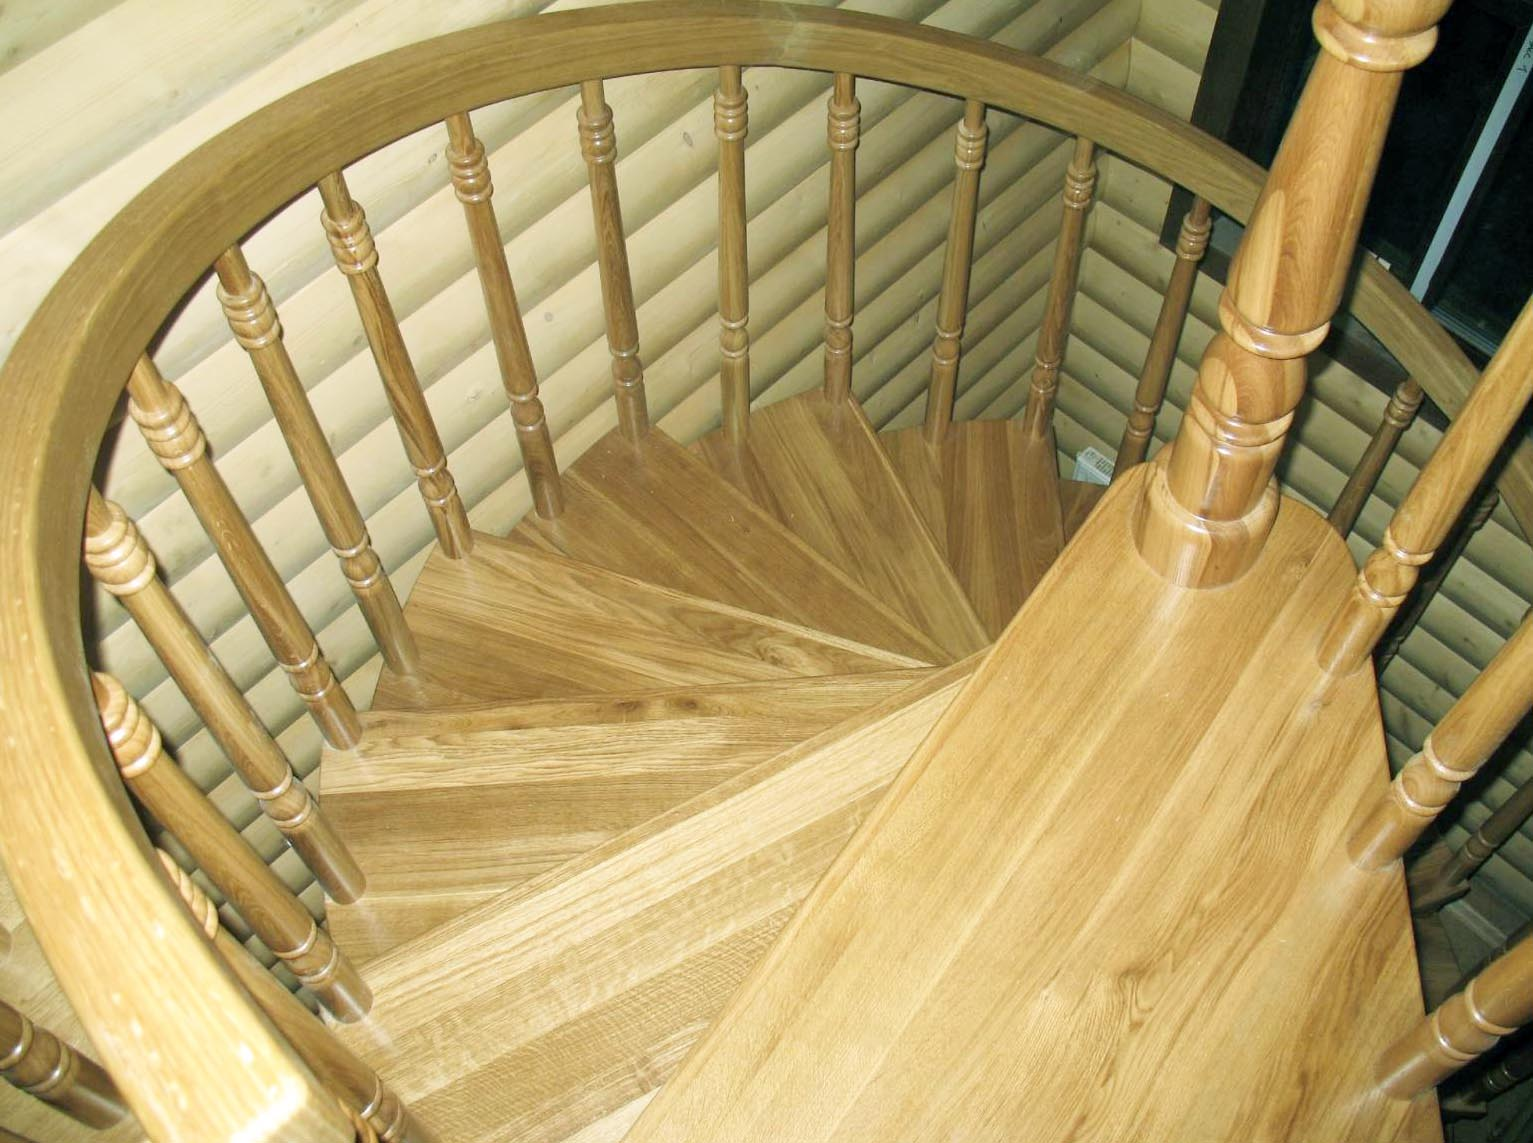 Винтовая лестница своими руками: фото, схема, видео инструкция винтовая лестница своими руками: фото, схема, видео инструкция